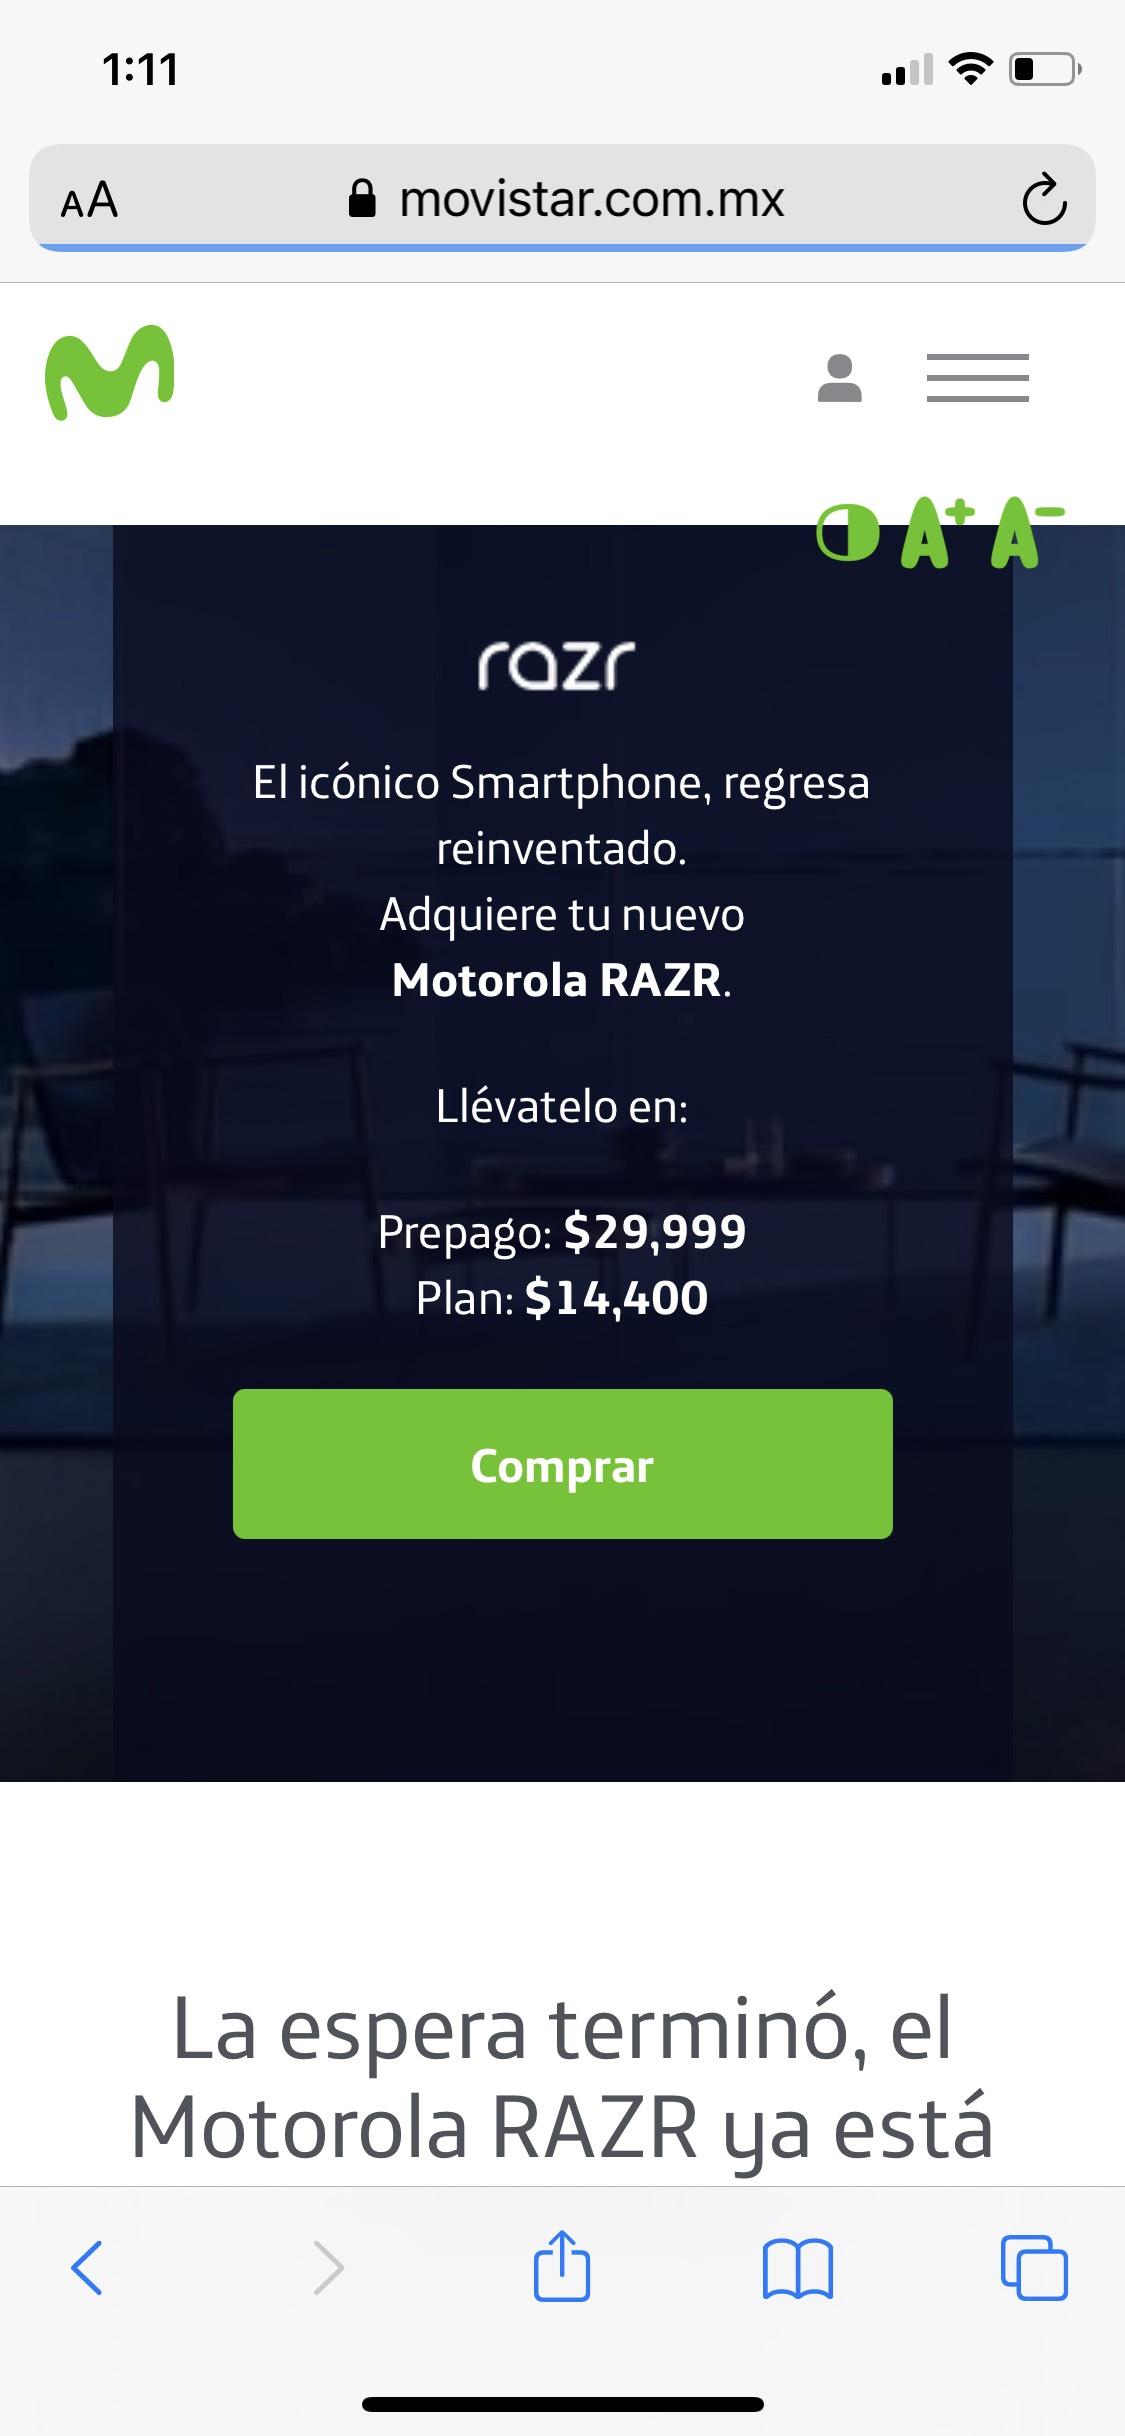 Movistar: Motorola RAZR teléfono plegable a $14,400 al contratar un plan